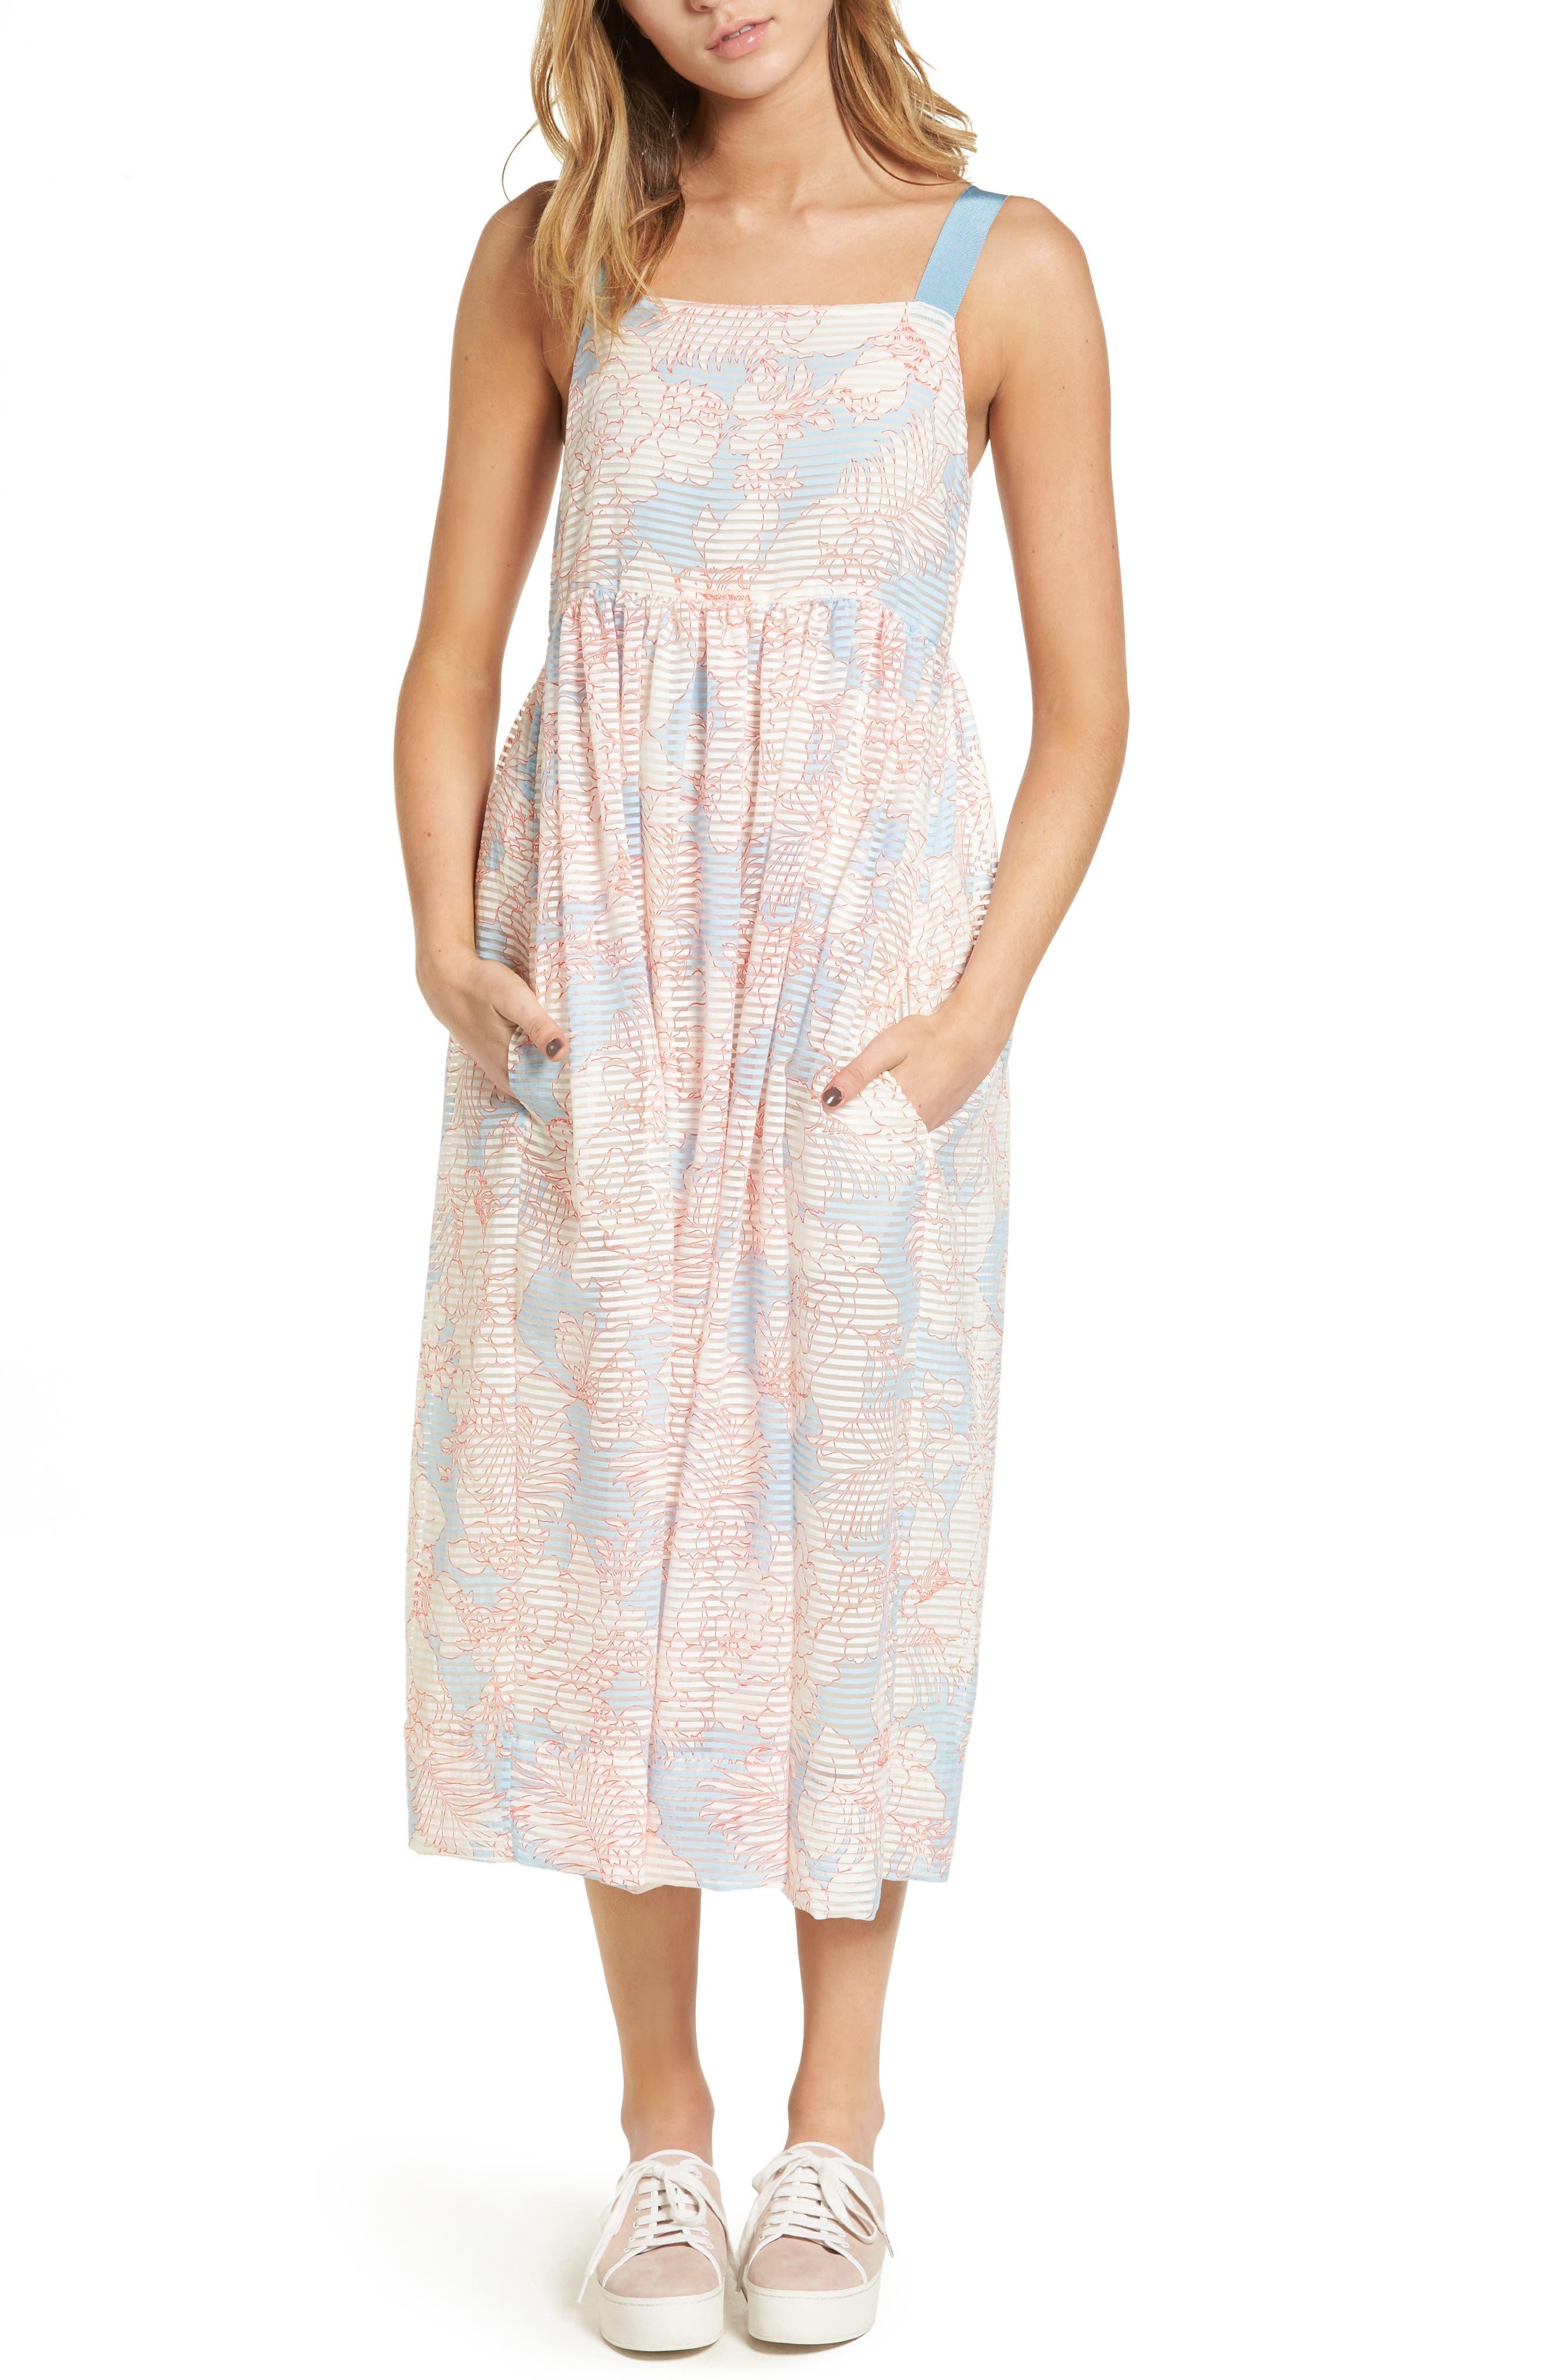 Bahamas Print Midi Dress,                             Main thumbnail 1, color,                             Bleu